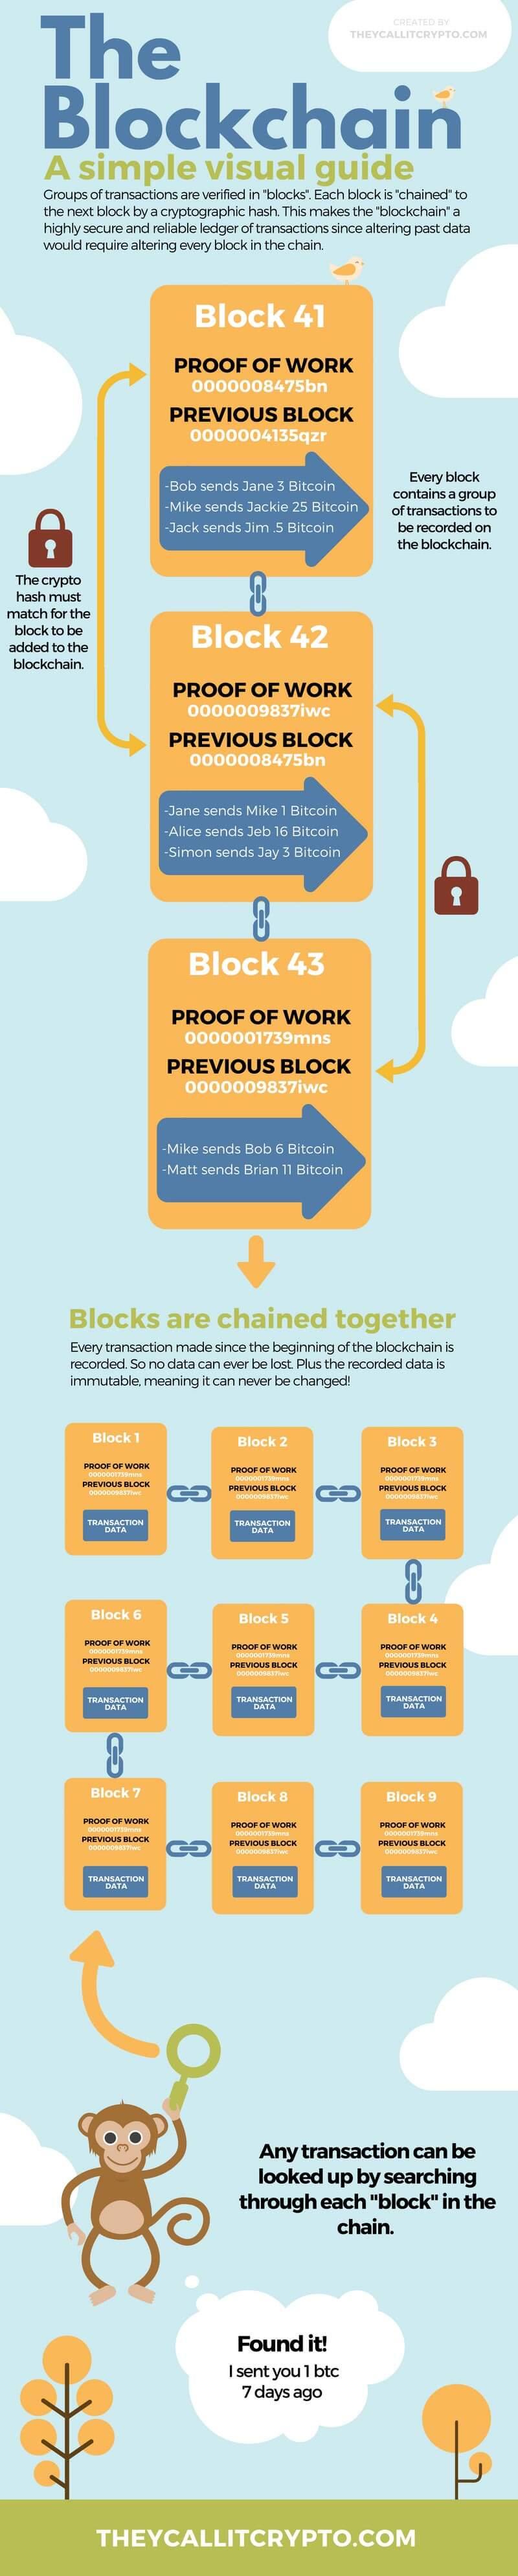 infographic explaining how the blockchain works